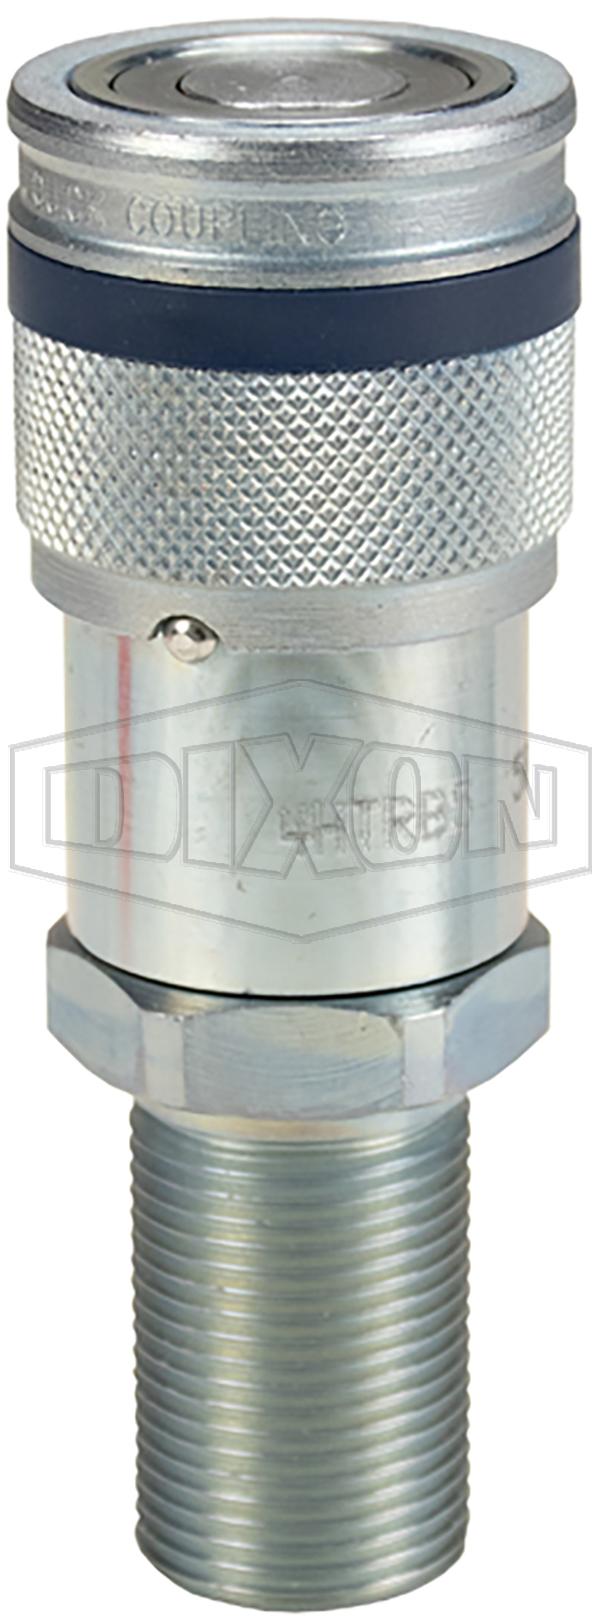 DQC HT-Series Correct Connect™ Flushface Male Threaded Bulkhead Coupler